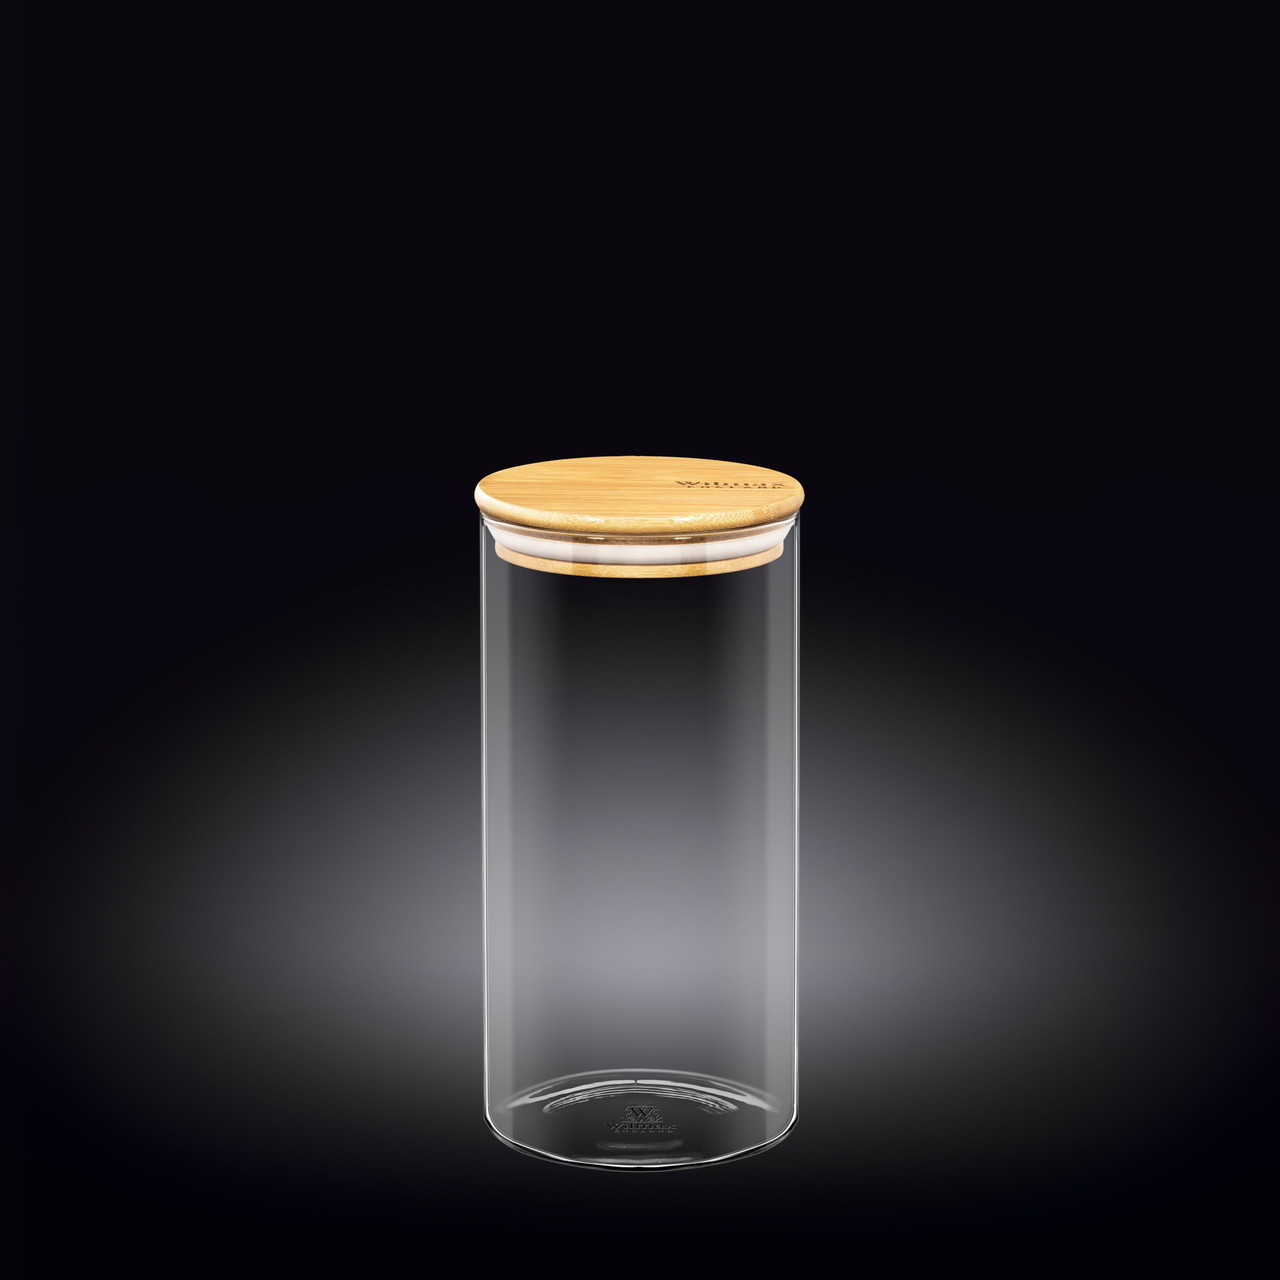 Банка 1300 мл Thermo Glass Wilmax с бамбуковой крышкой